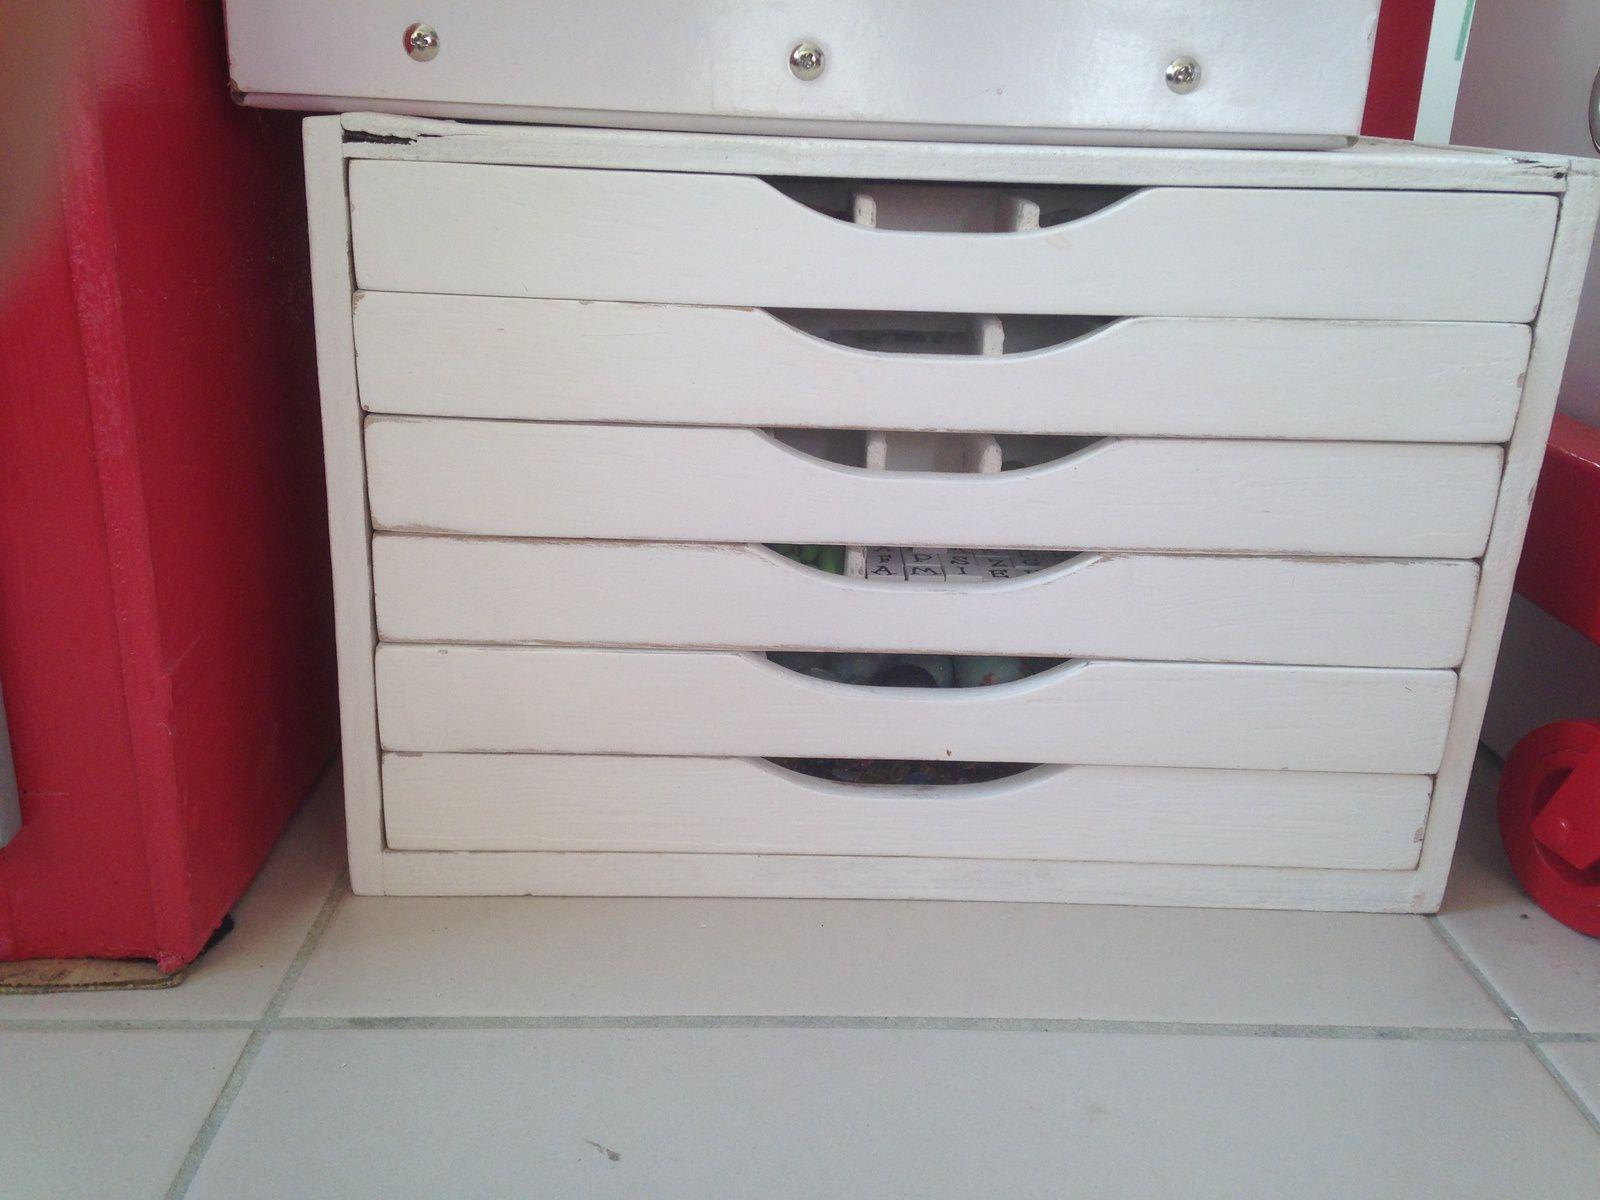 #diy #bricolage #meuble #retapé #petitsrangements #fèves #perles #charlotteblabla blog